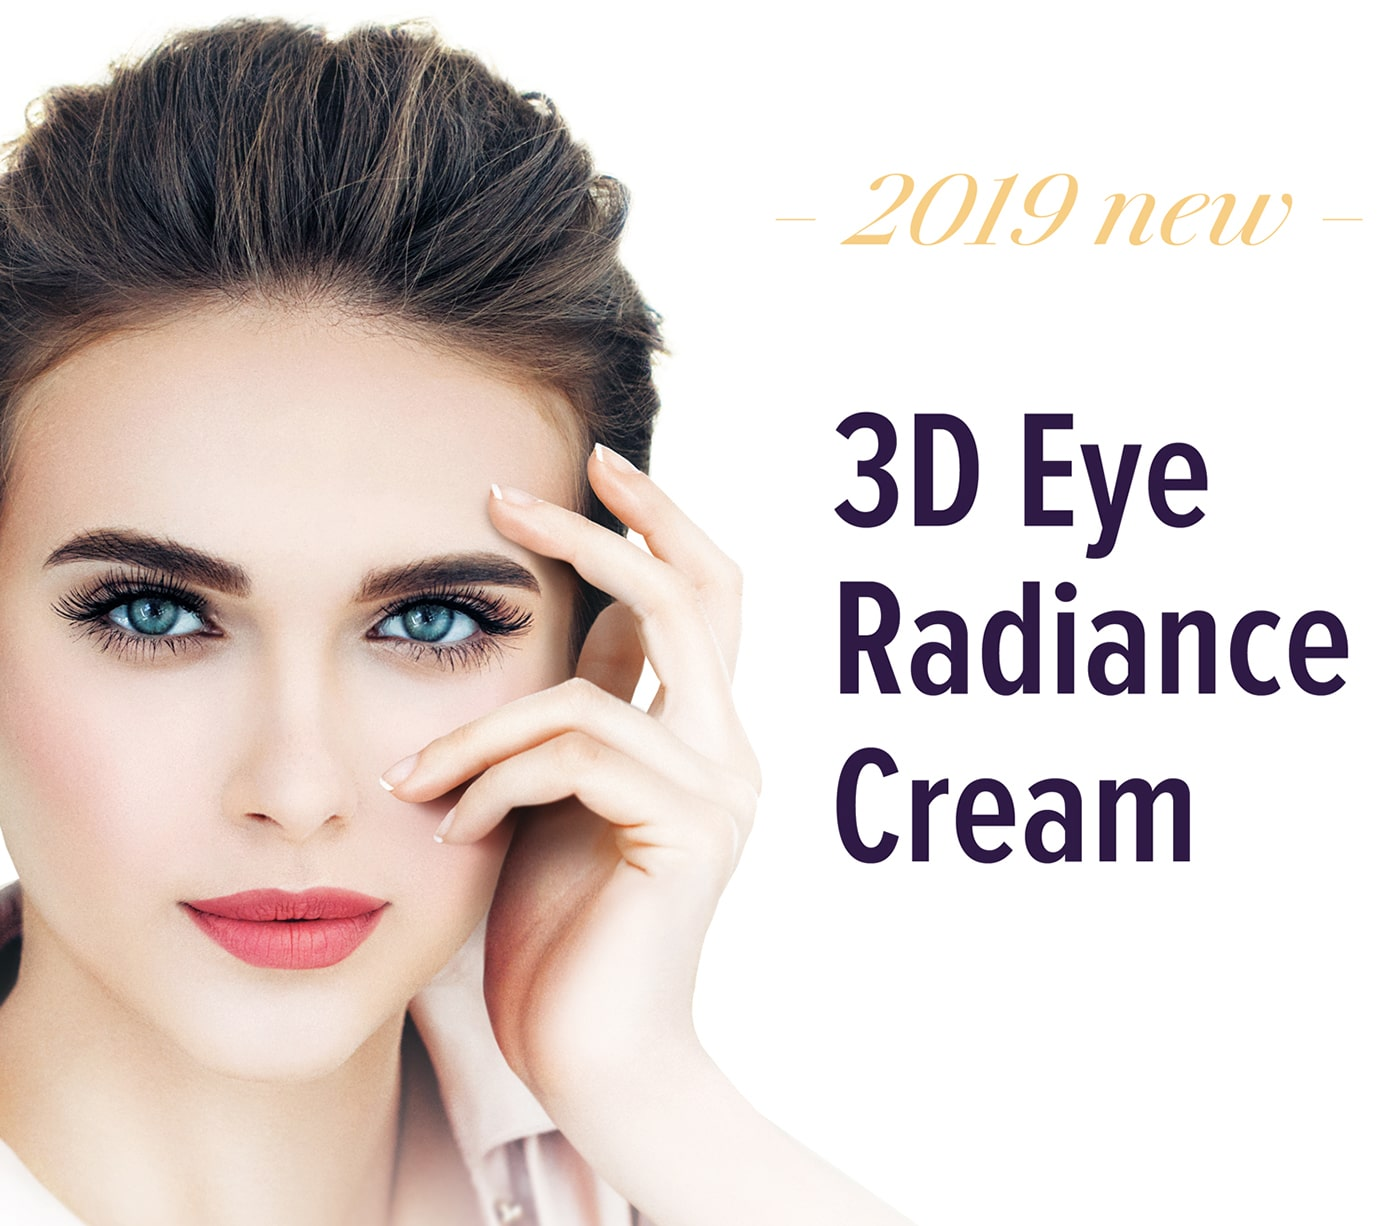 3D Eye Radiance Cream